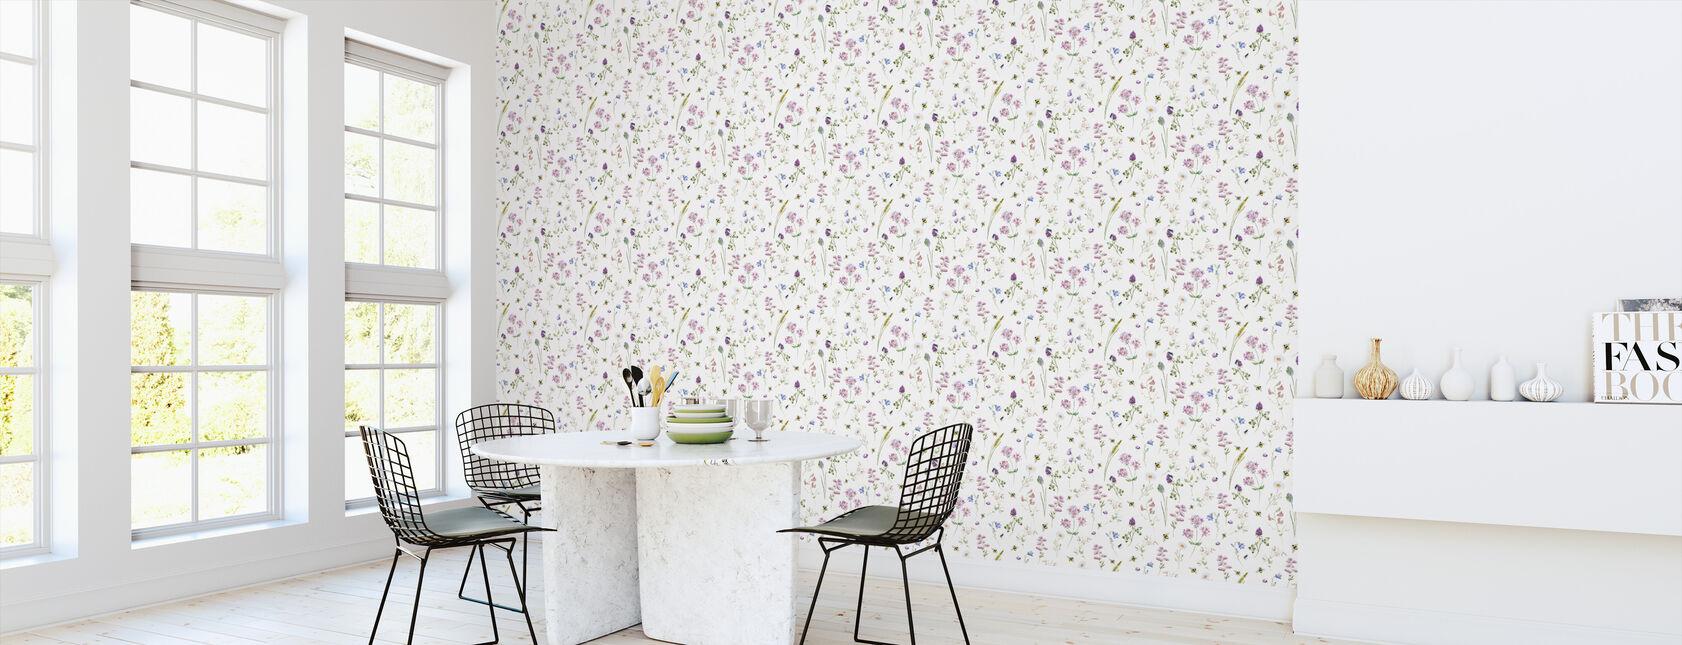 Vilde blomster Akvarel Mønster - Tapet - Køkken